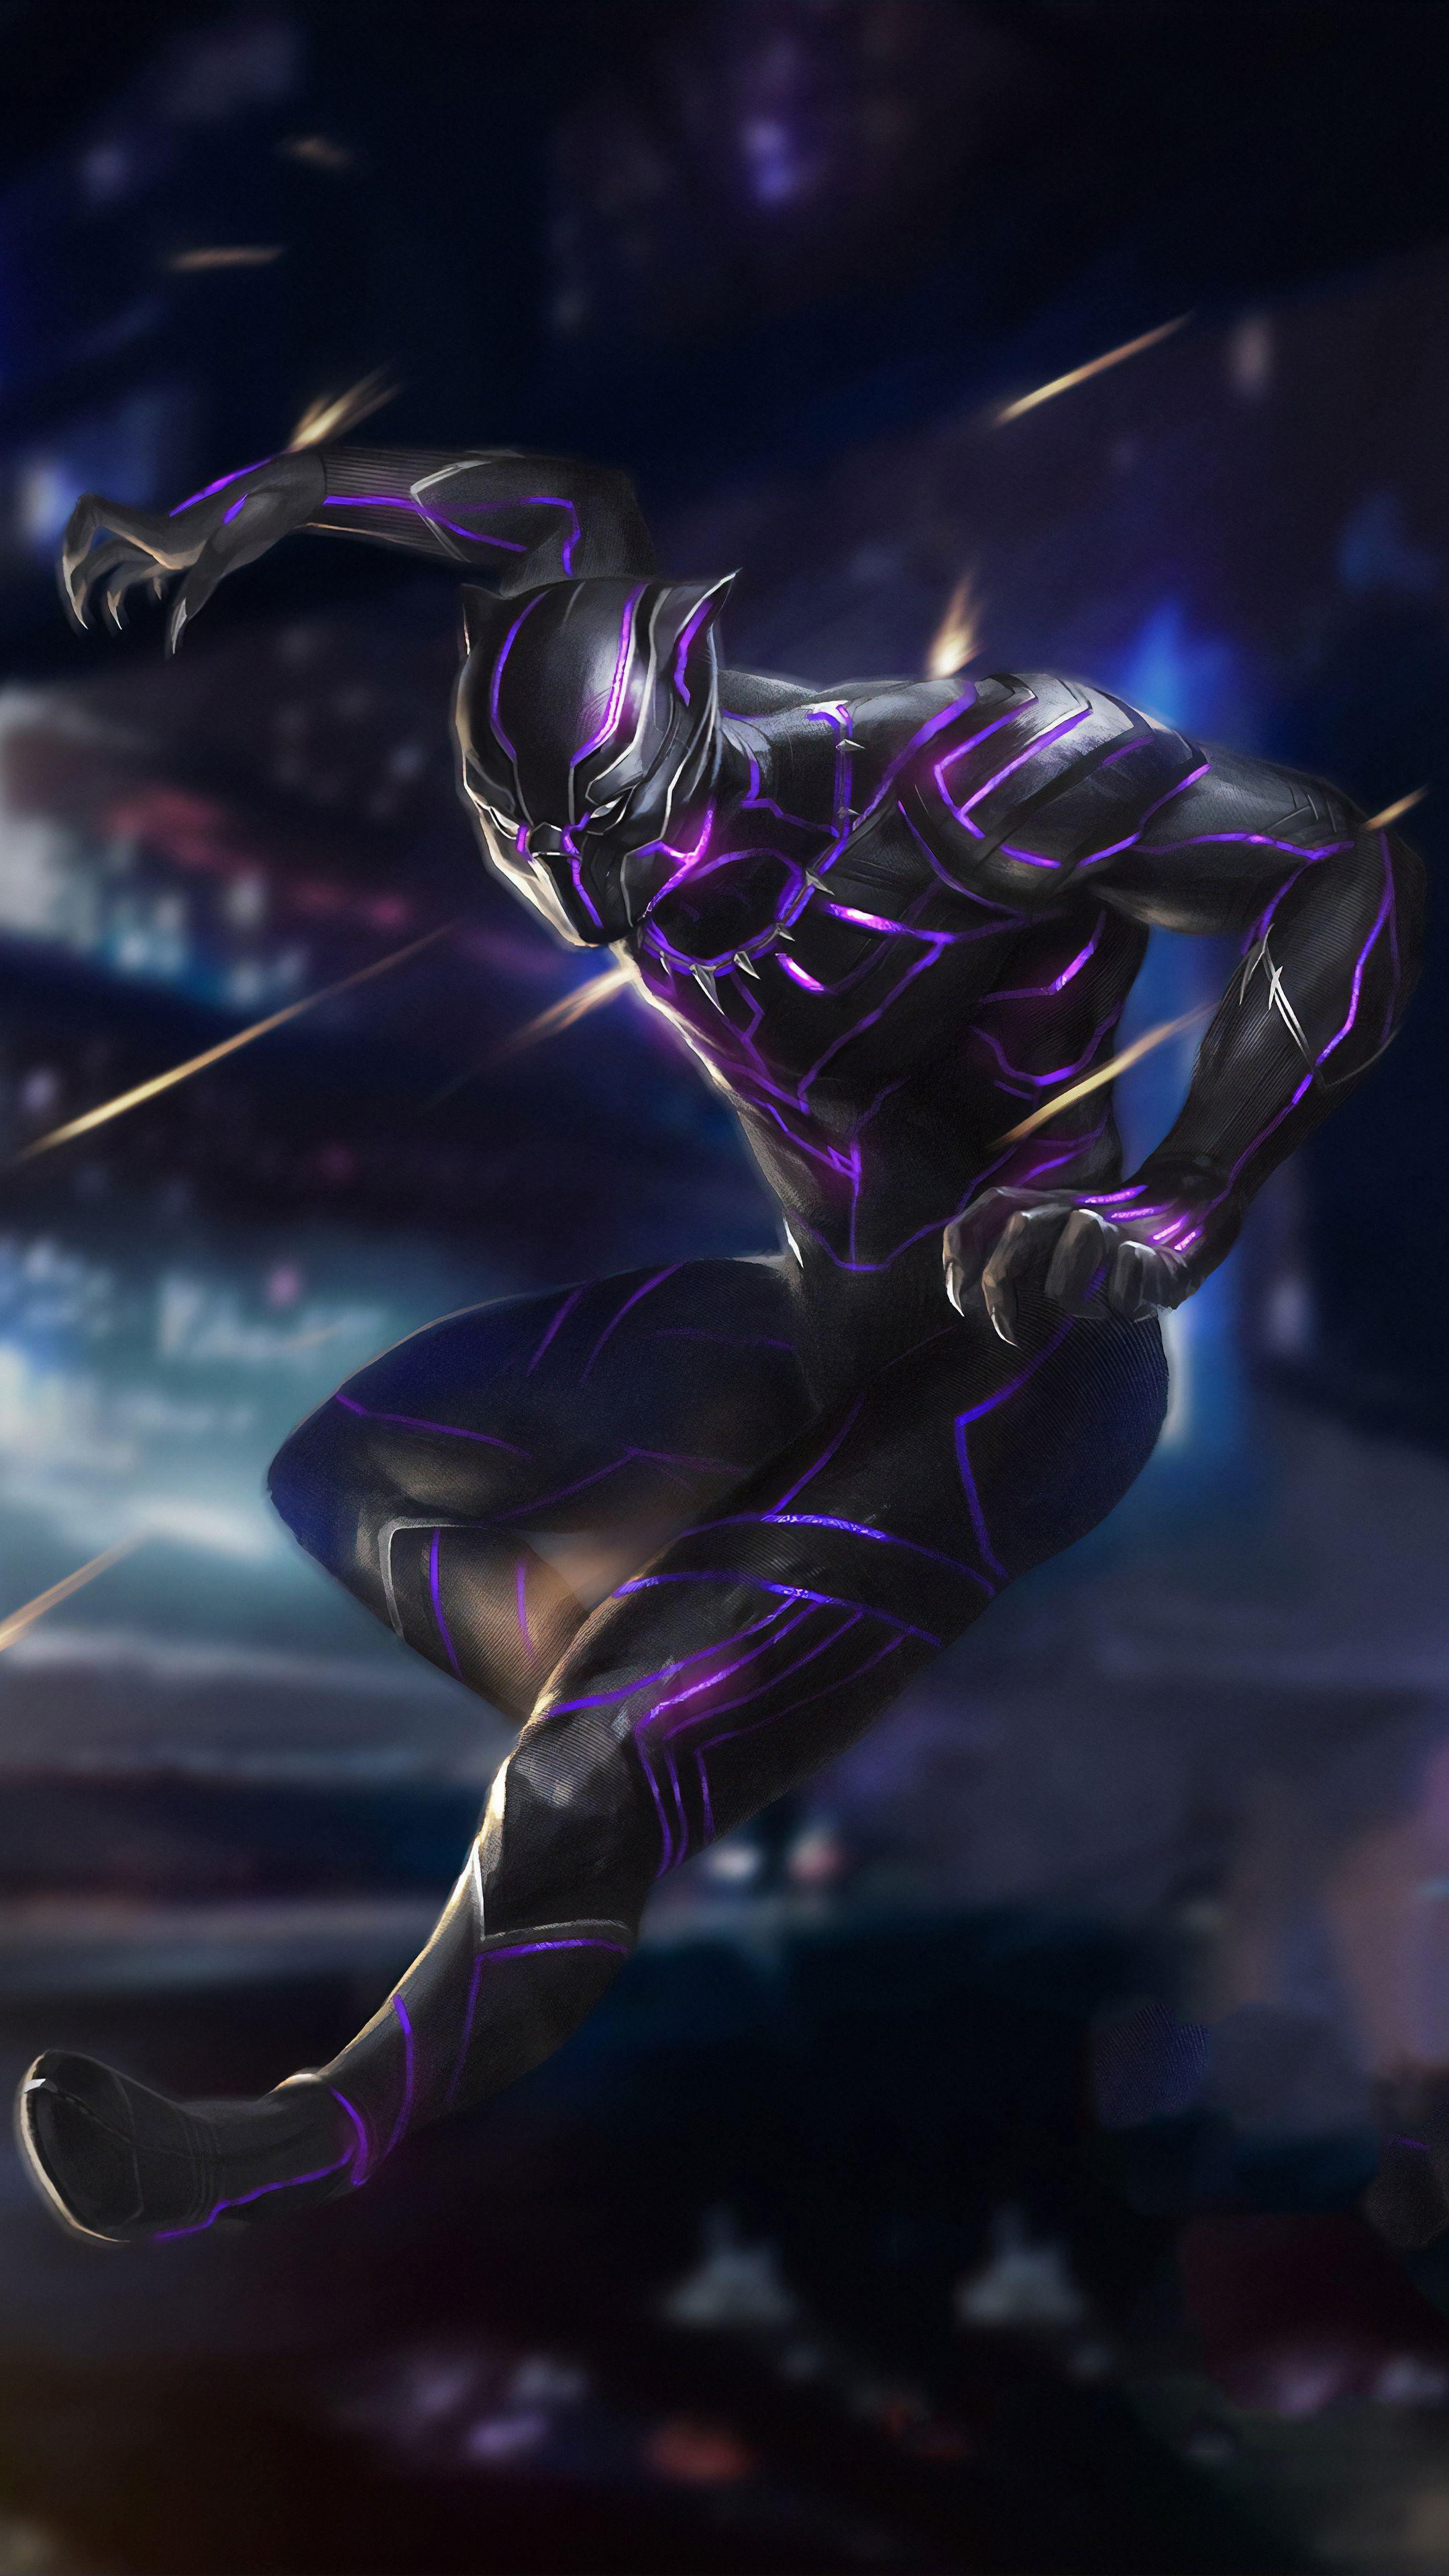 Black Panther Wallpaper 4k Mobile Gallery Black Panther Black Panther Art Black Panther Marvel